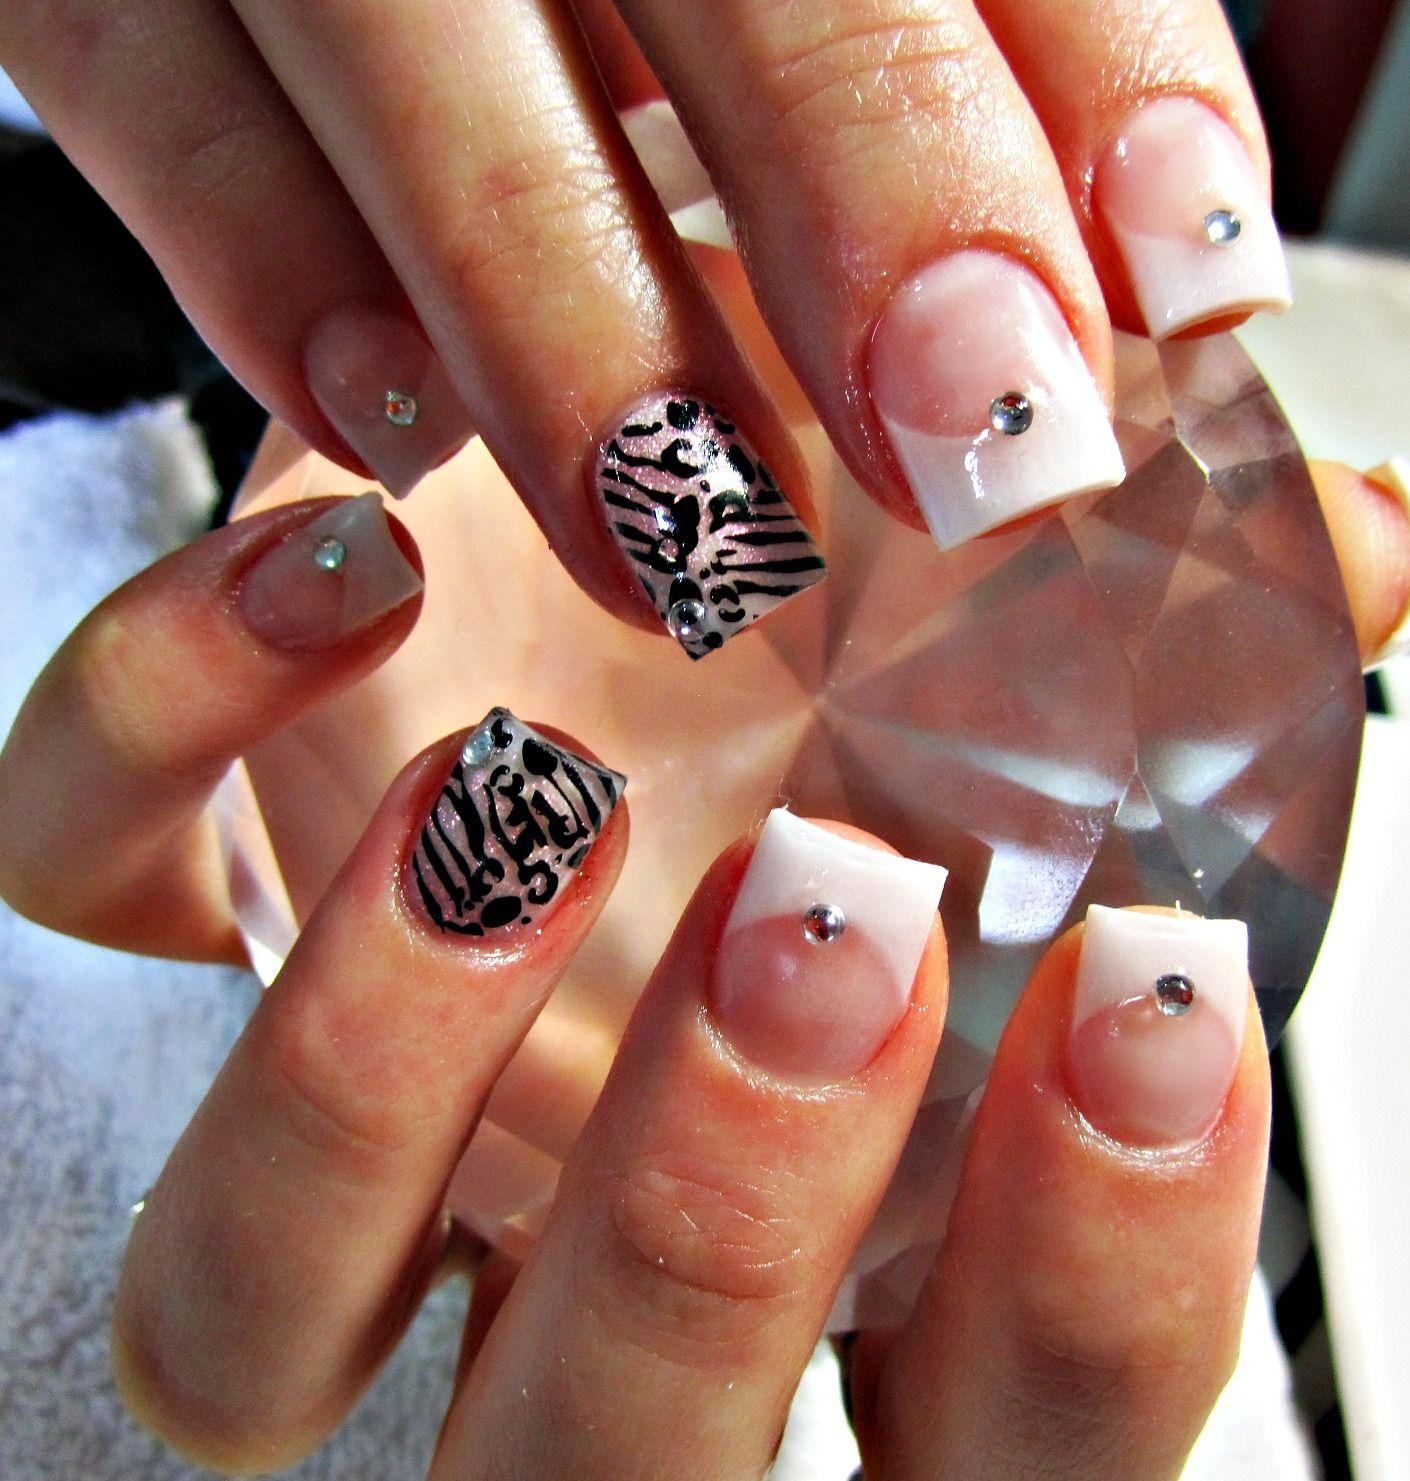 Wild french acrylic nails nails pinterest french acrylic nails